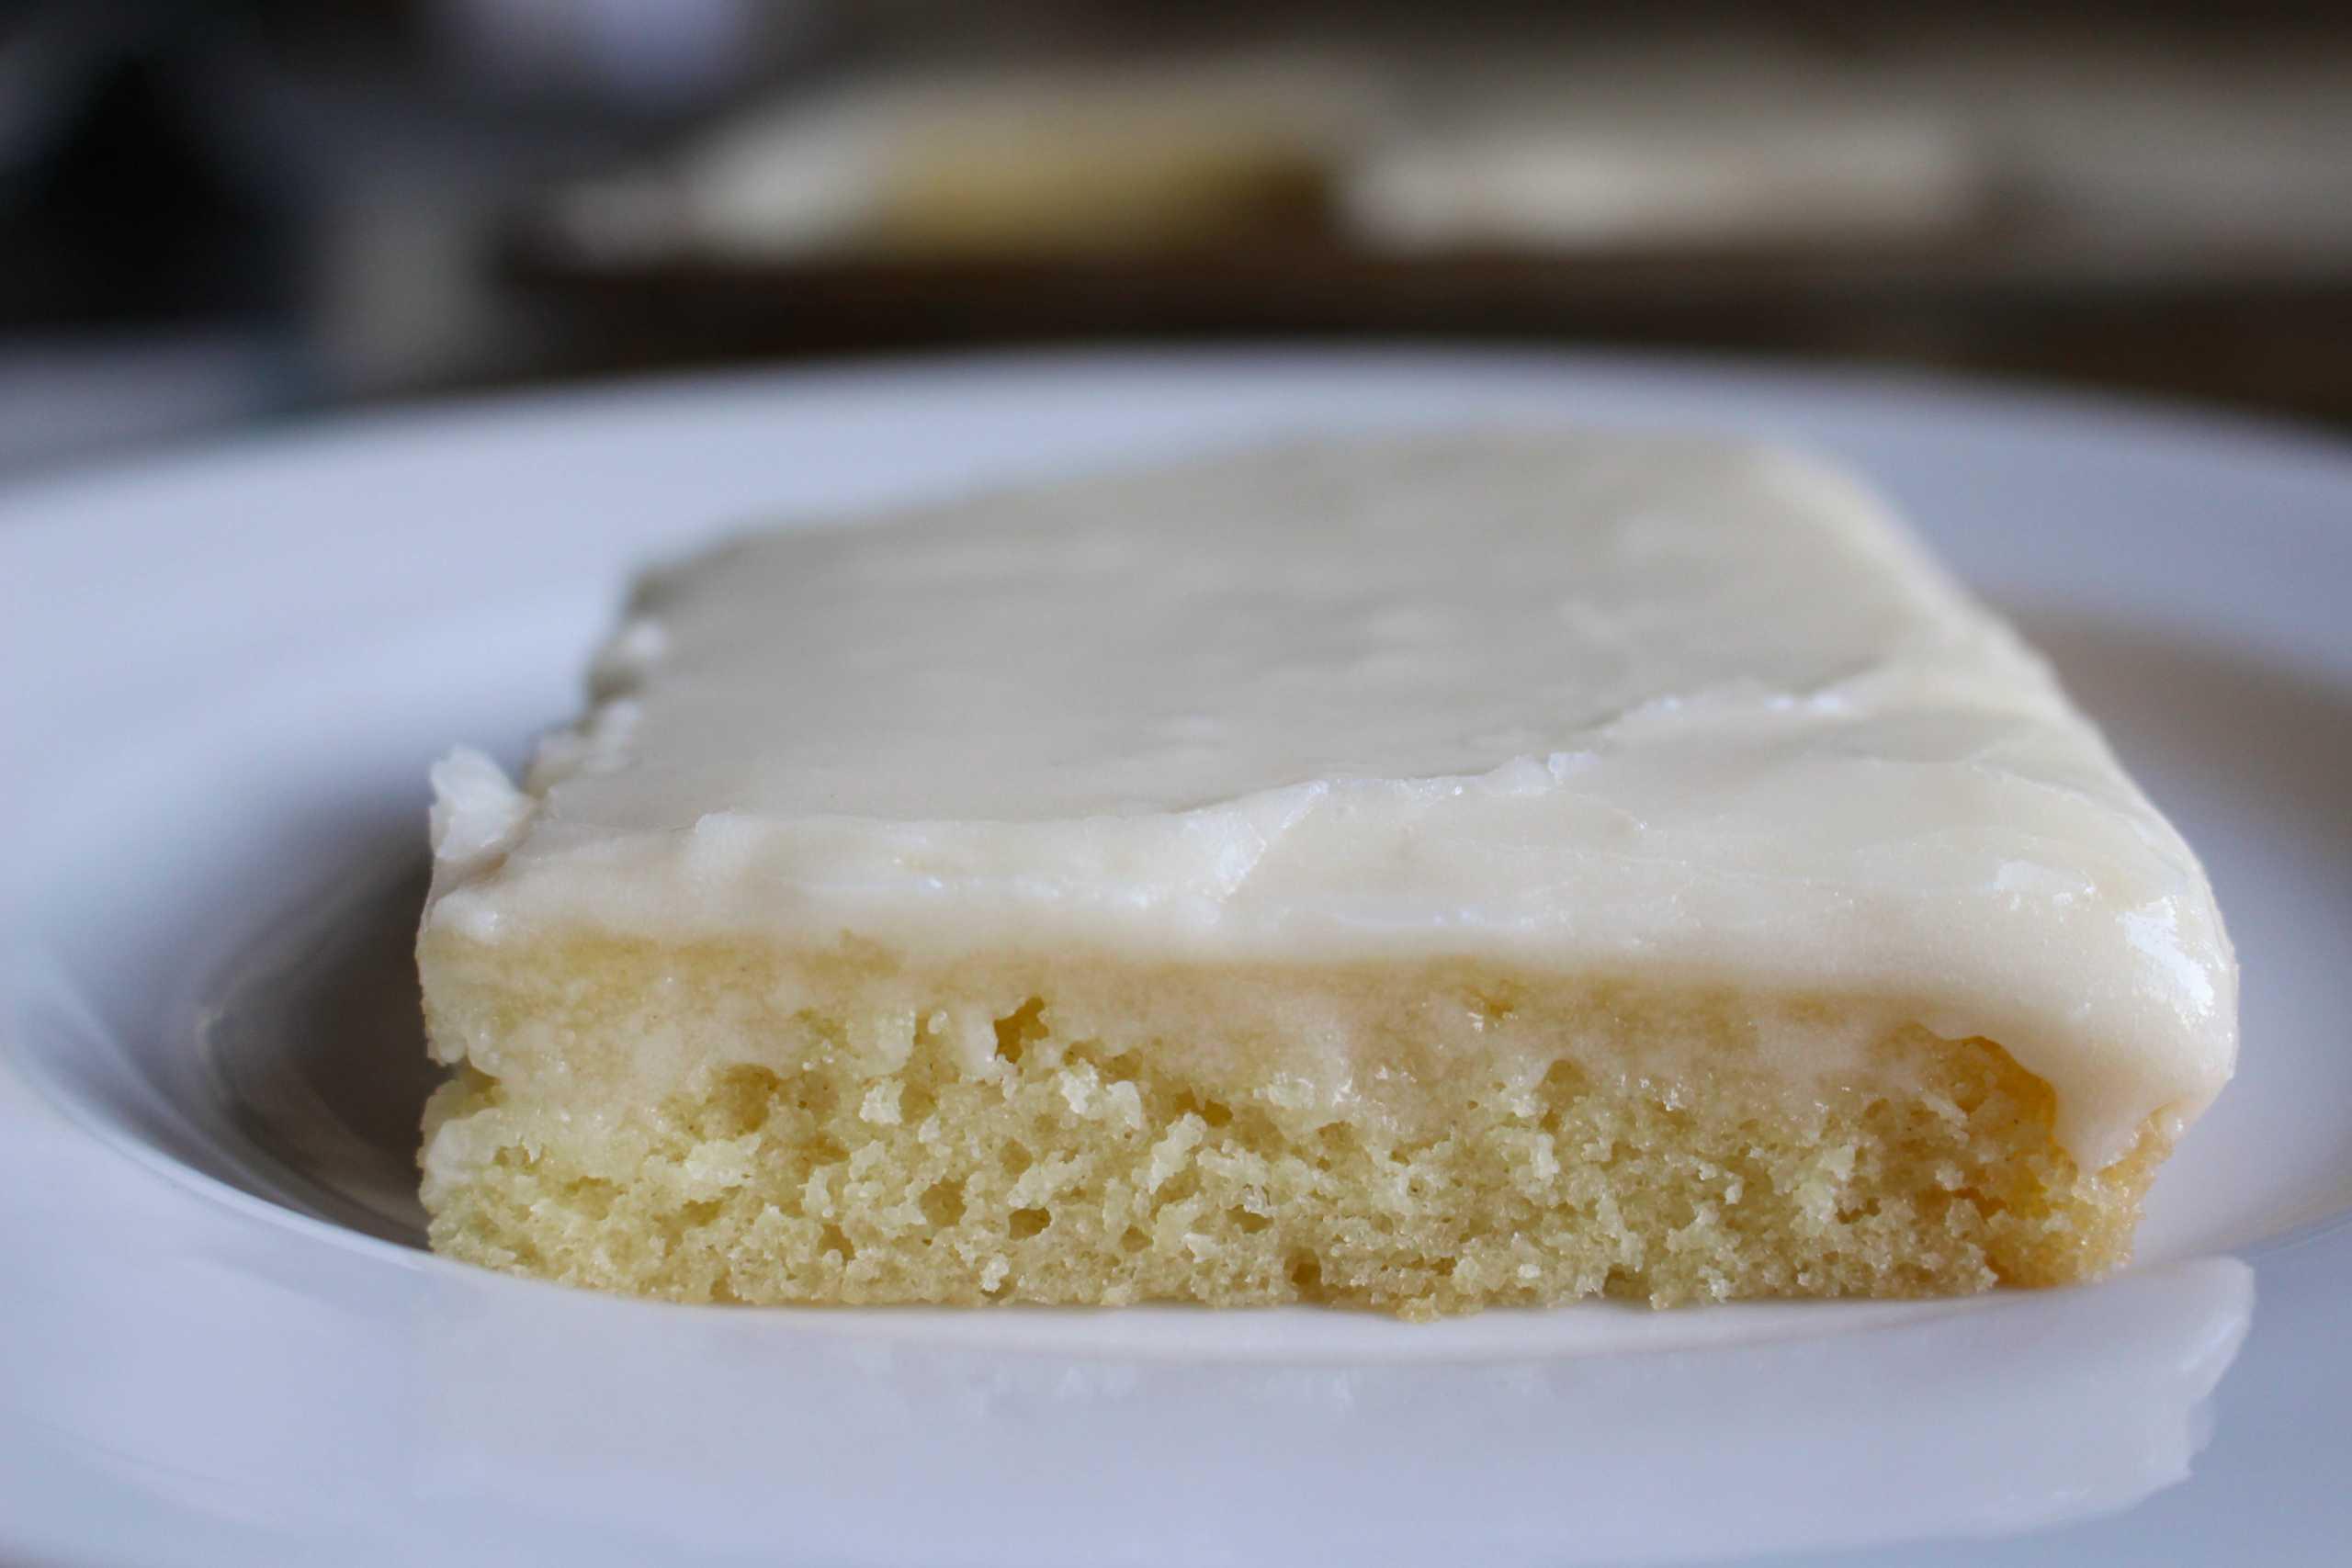 Texas sheet cake slice